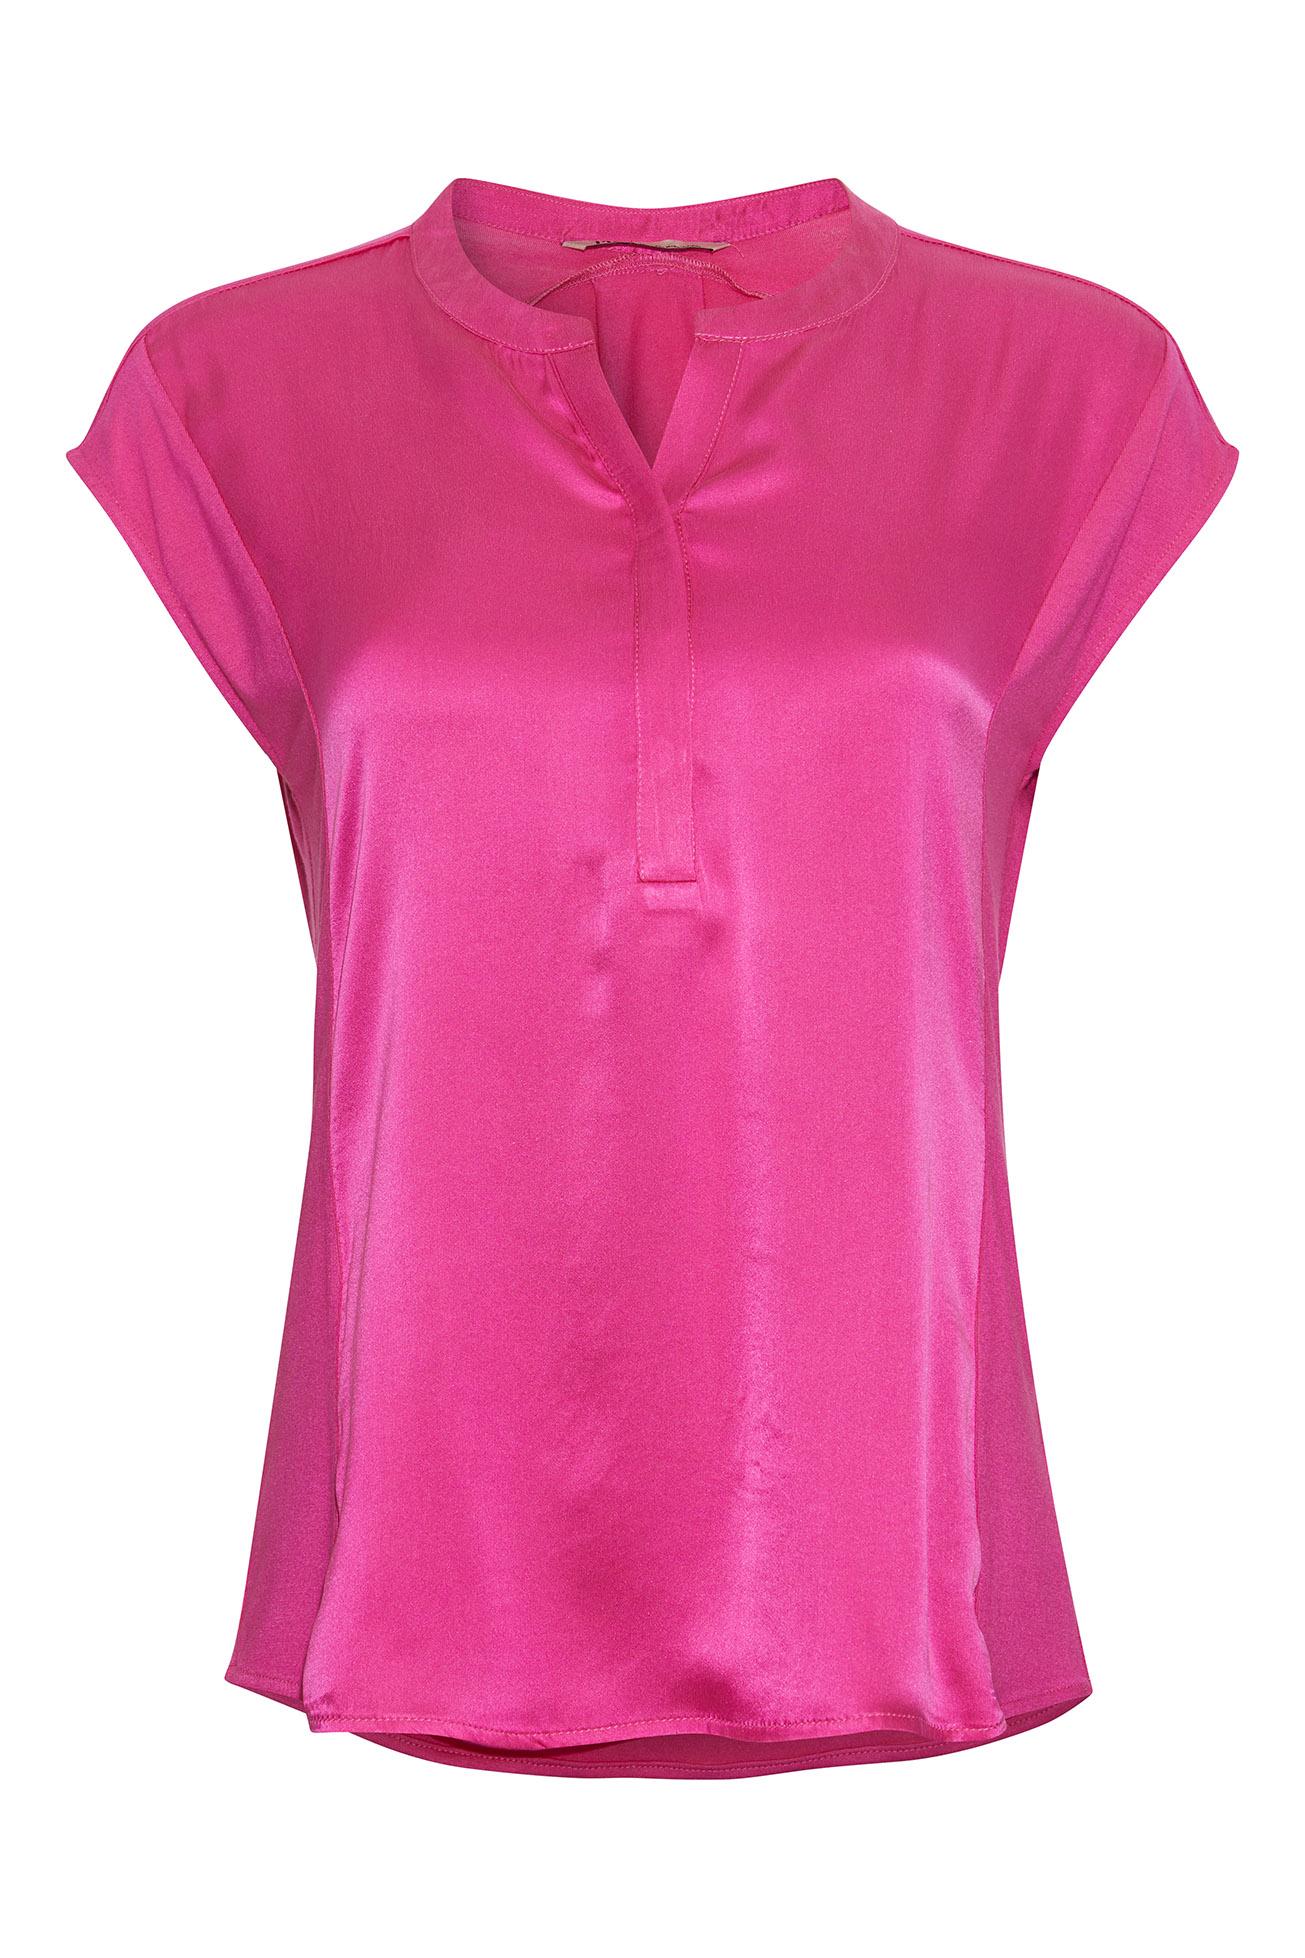 PBO GROUP – Bluse/t-shirts med silke